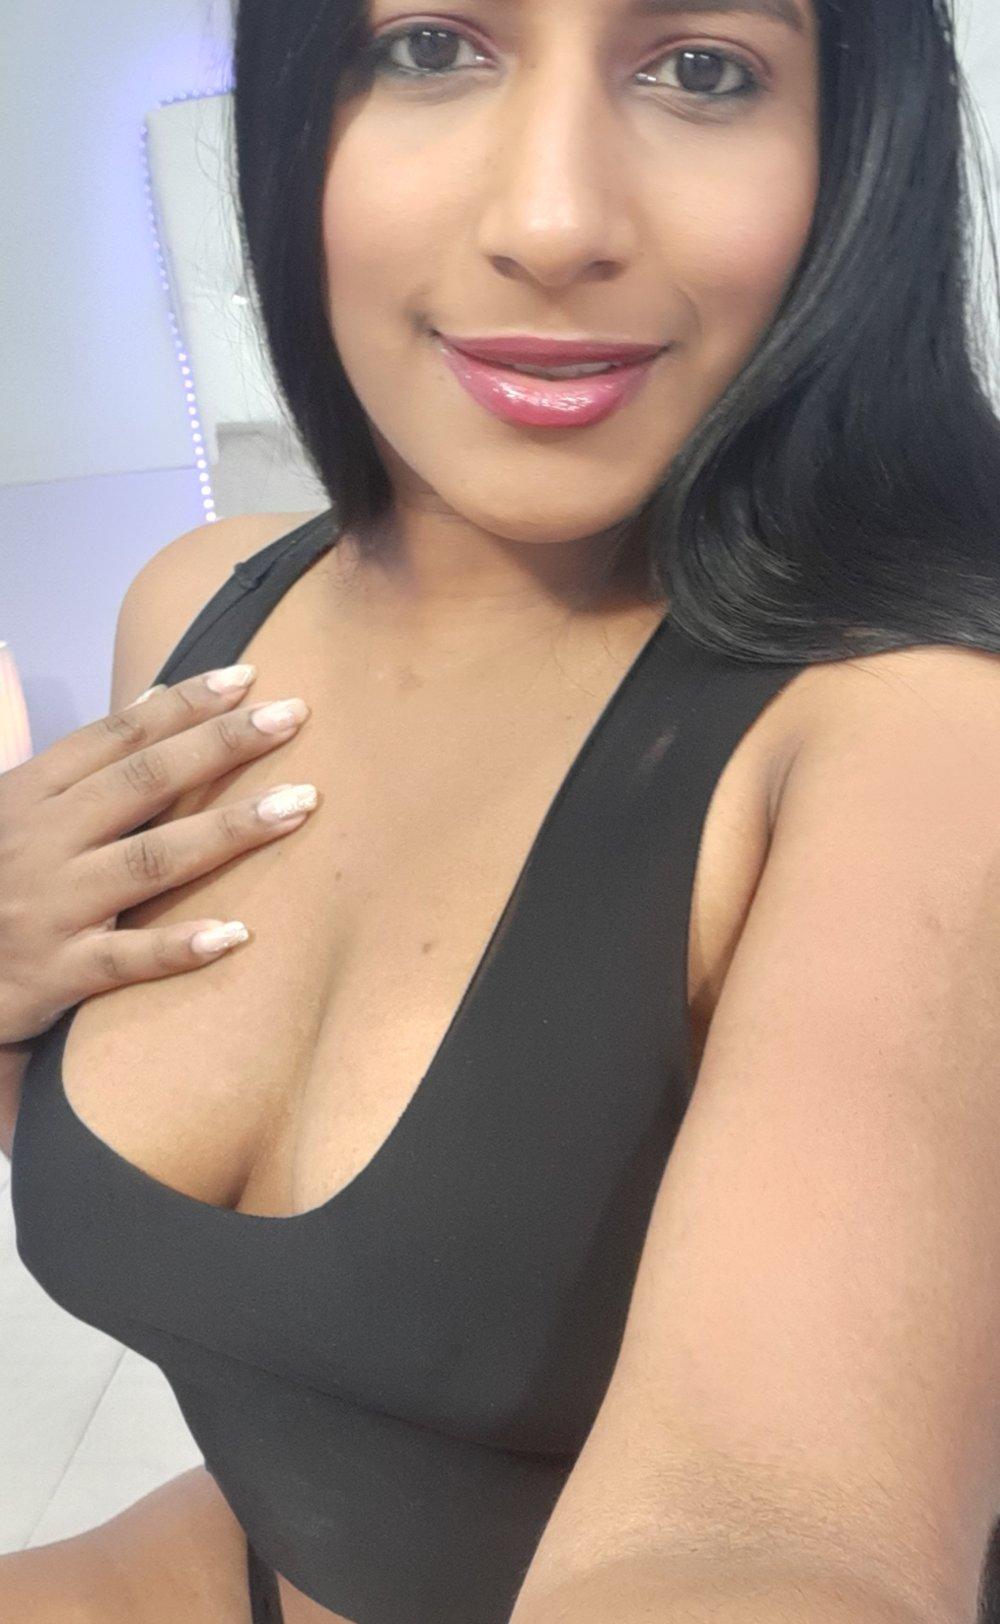 indiana_jonnes at StripChat